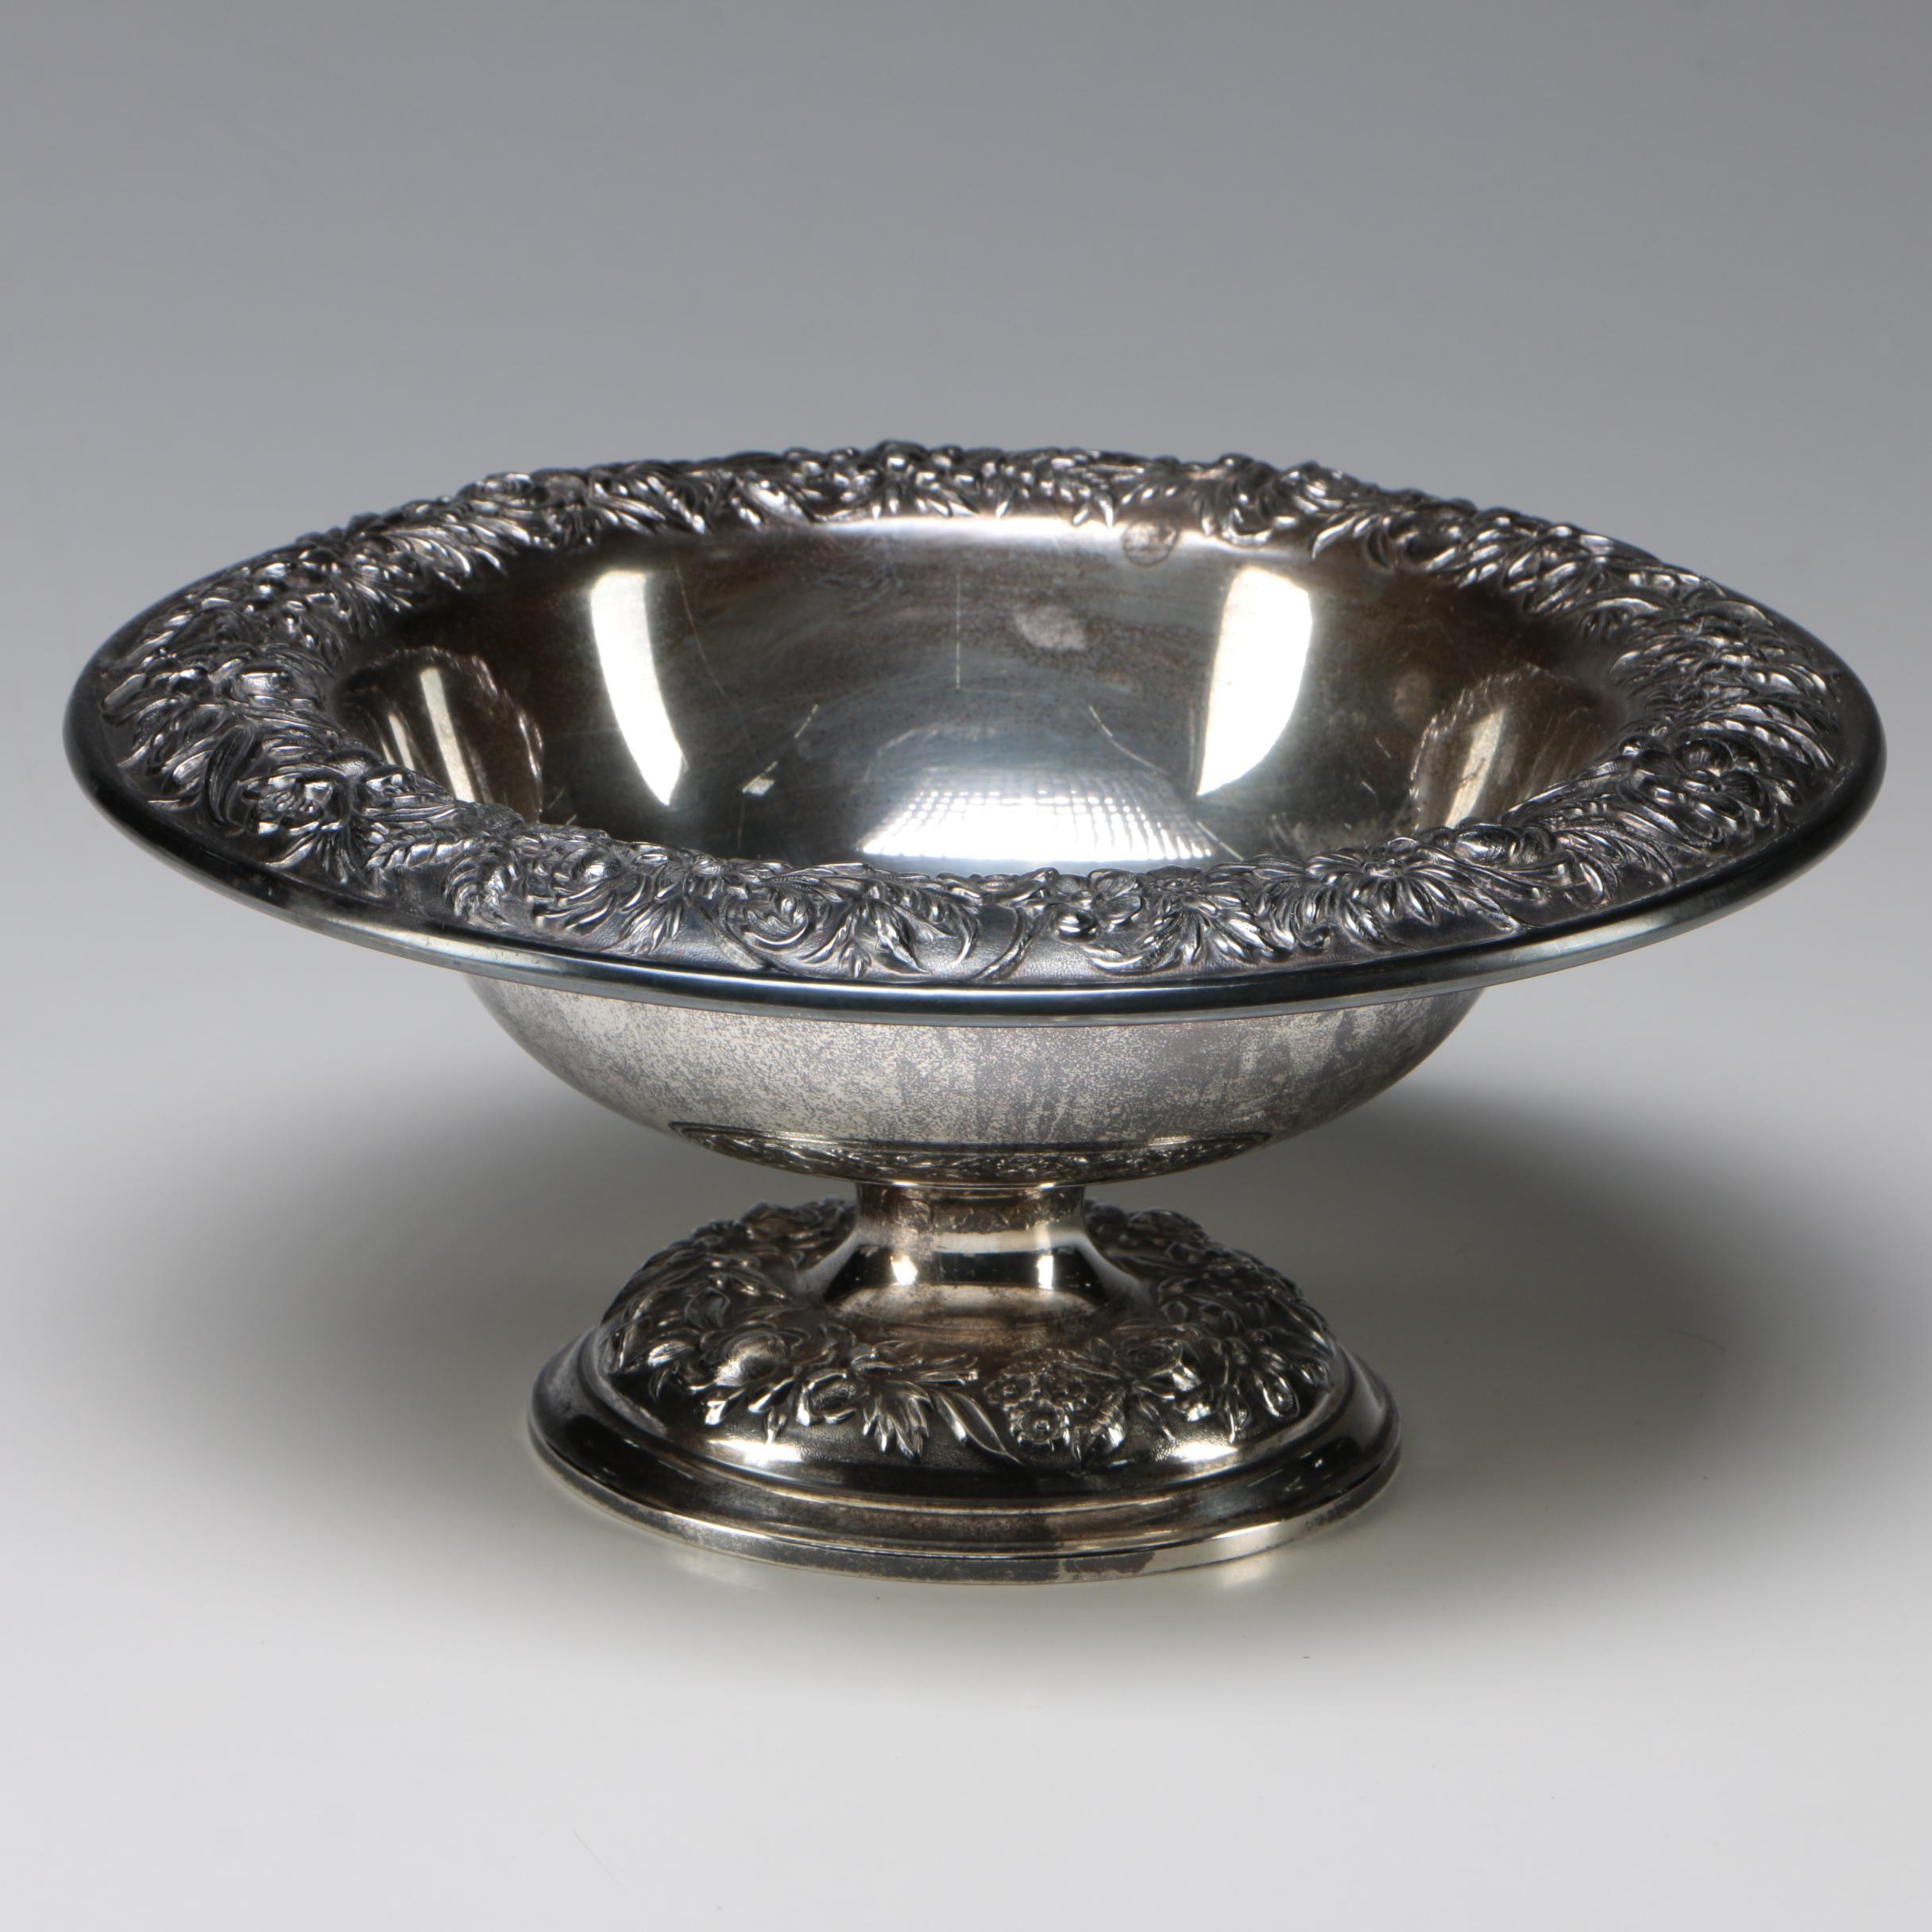 "S. Kirk & Son ""Repoussé"" Sterling Silver Pedestal Fruit Bowl, Early 20th Century"